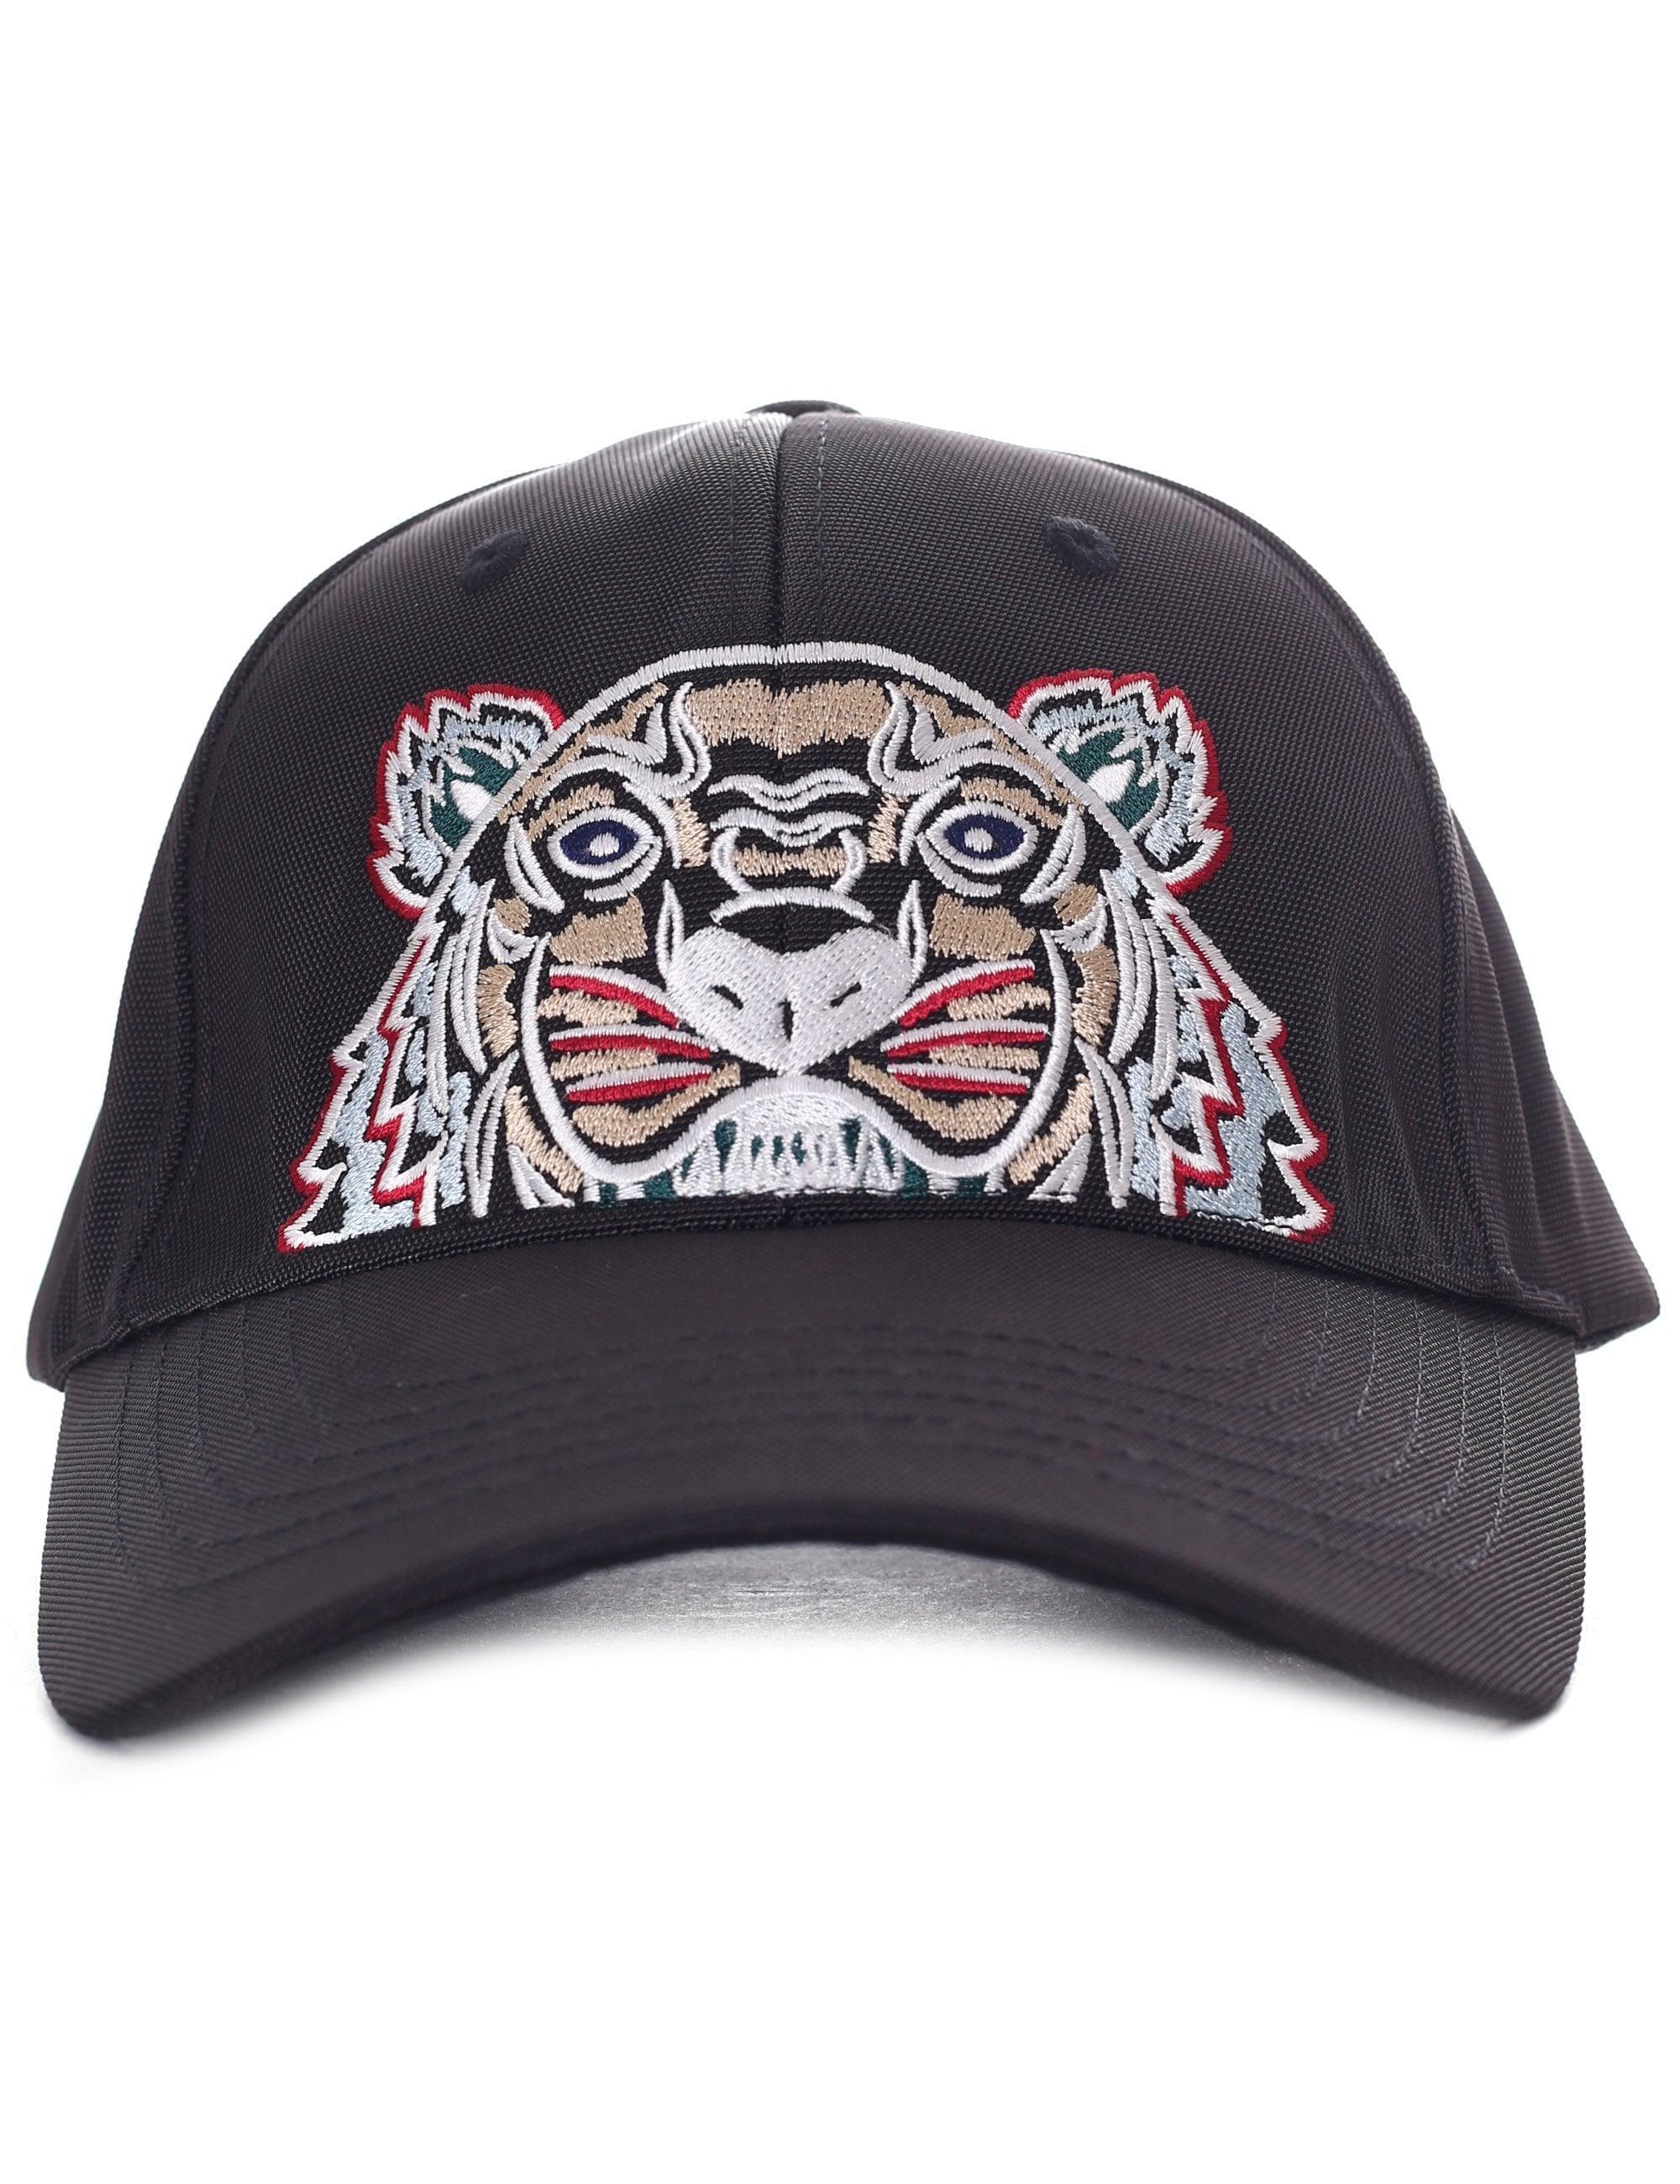 e4d63f4943 KENZO Men's Tiger Canvas Cap Black in Black for Men - Save 42% - Lyst